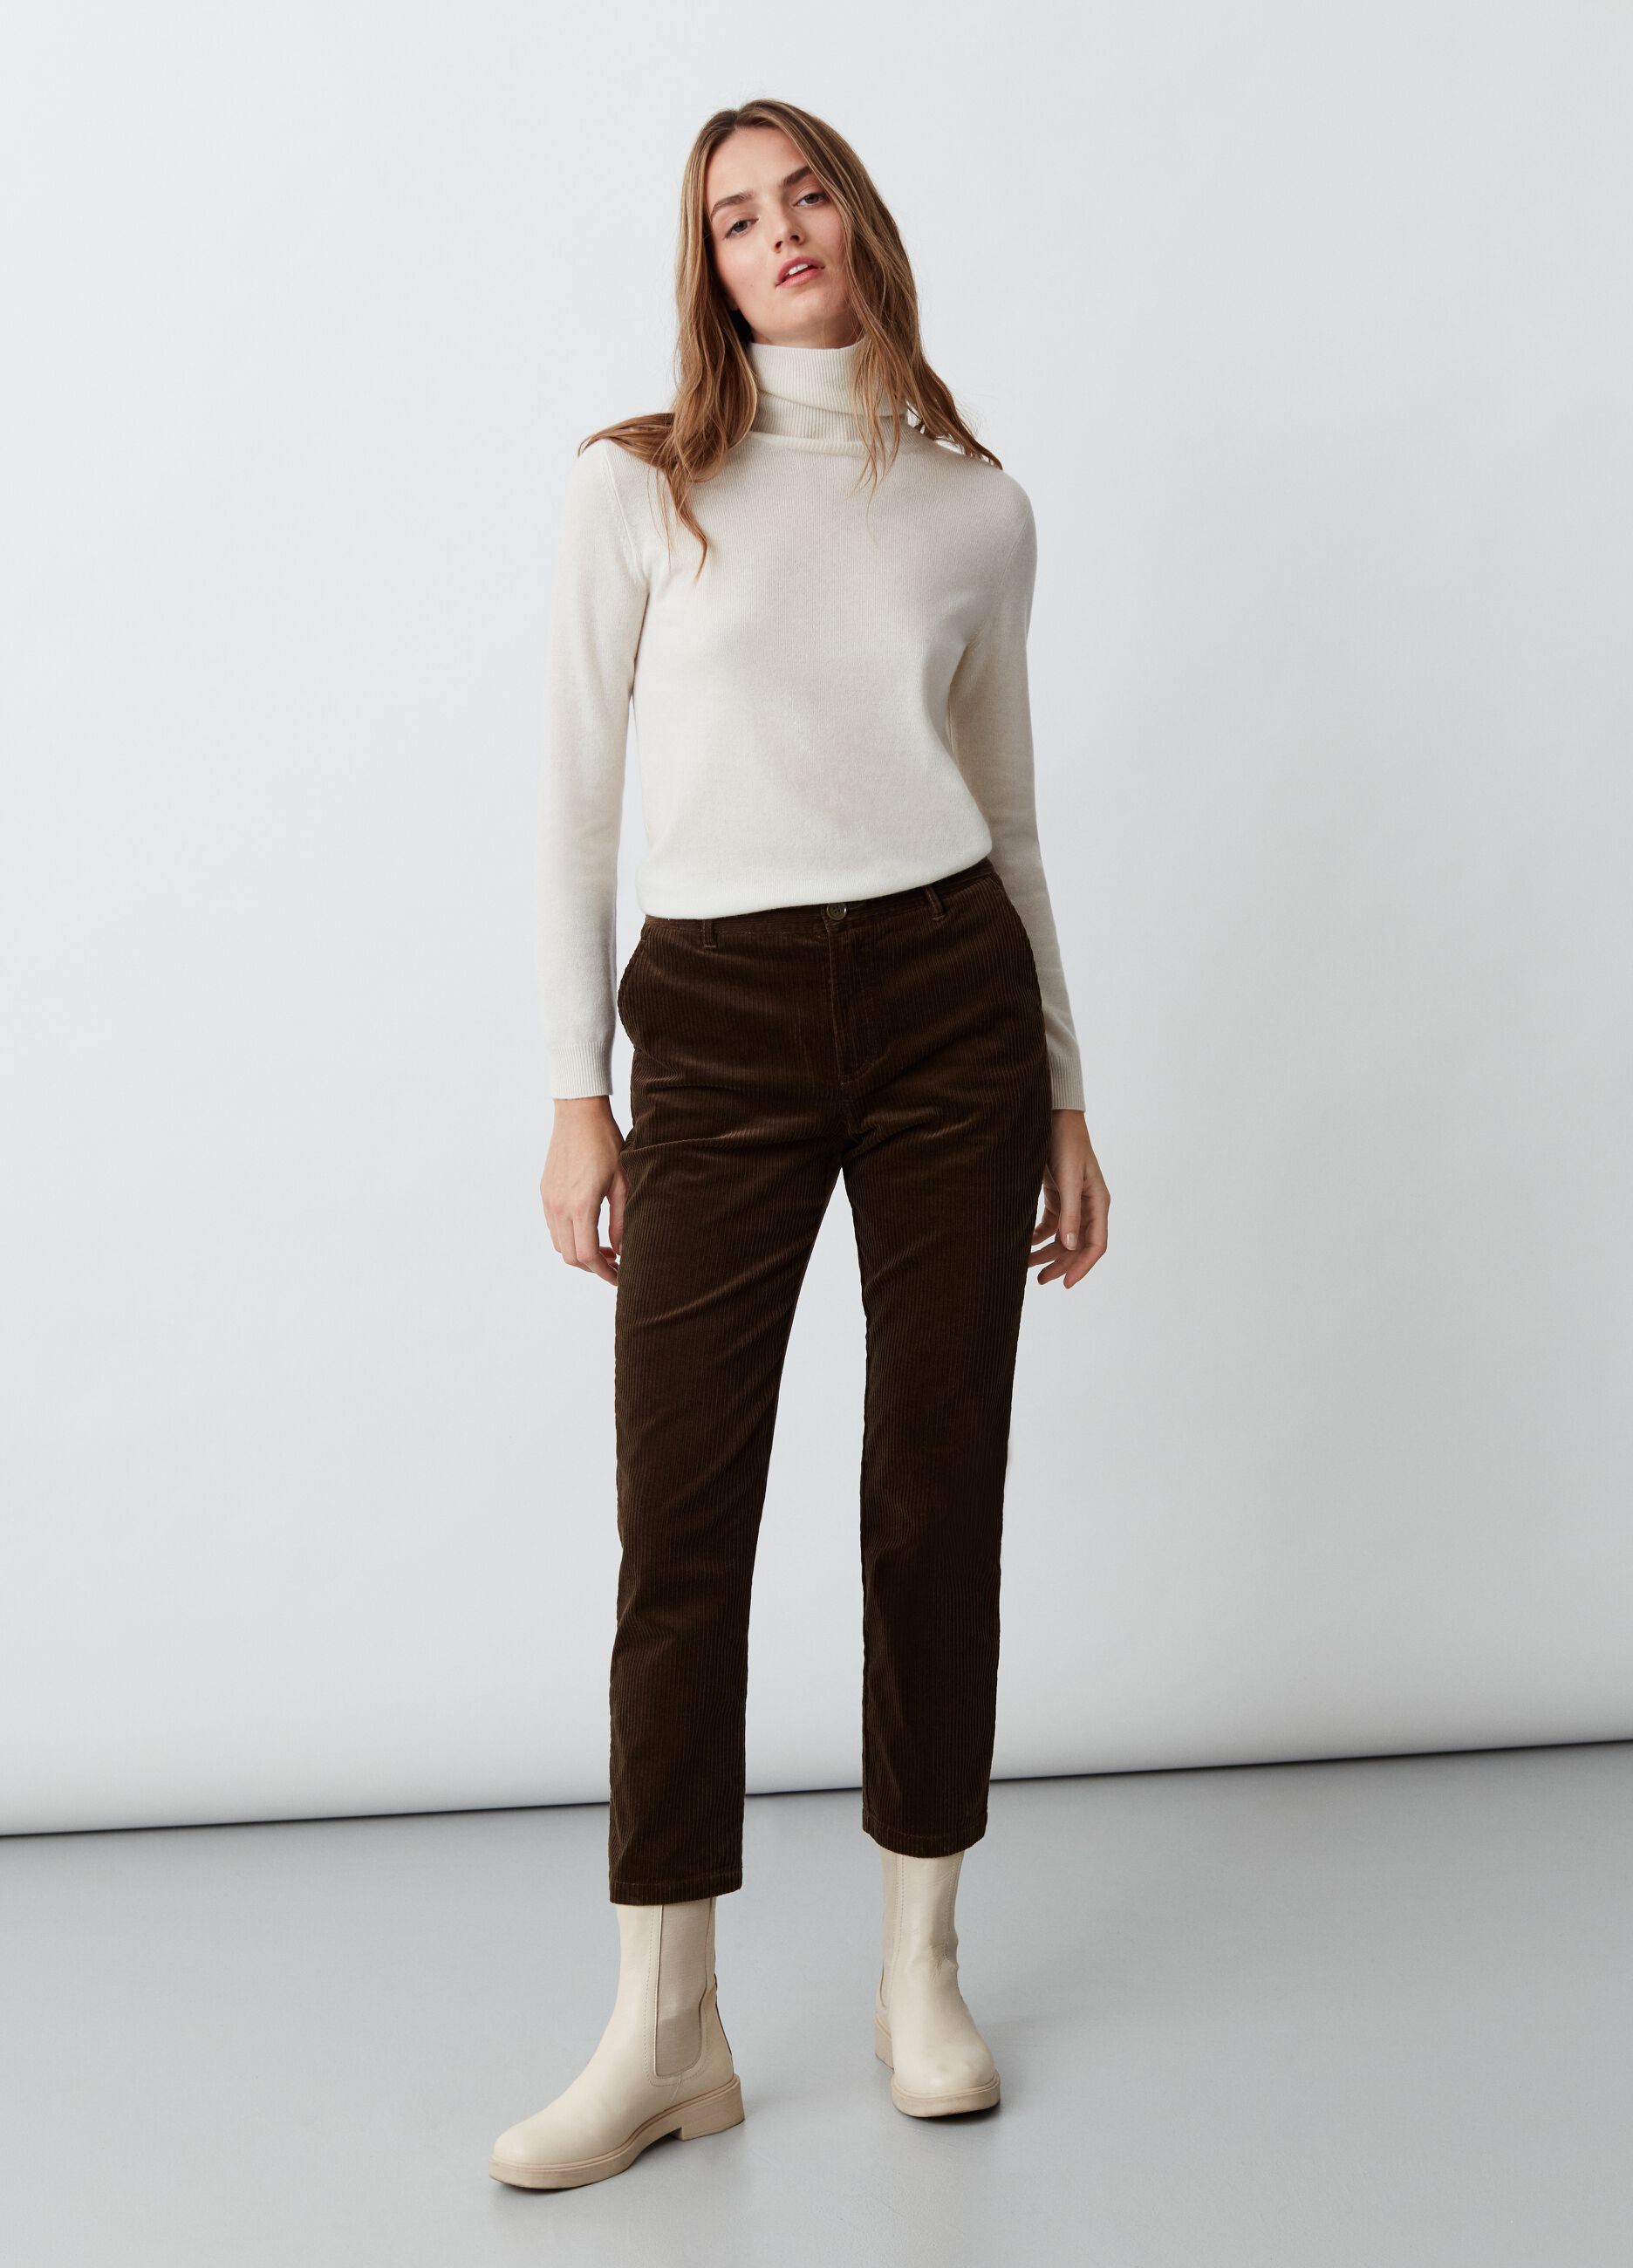 Pantalone chino in corduroy Marrone